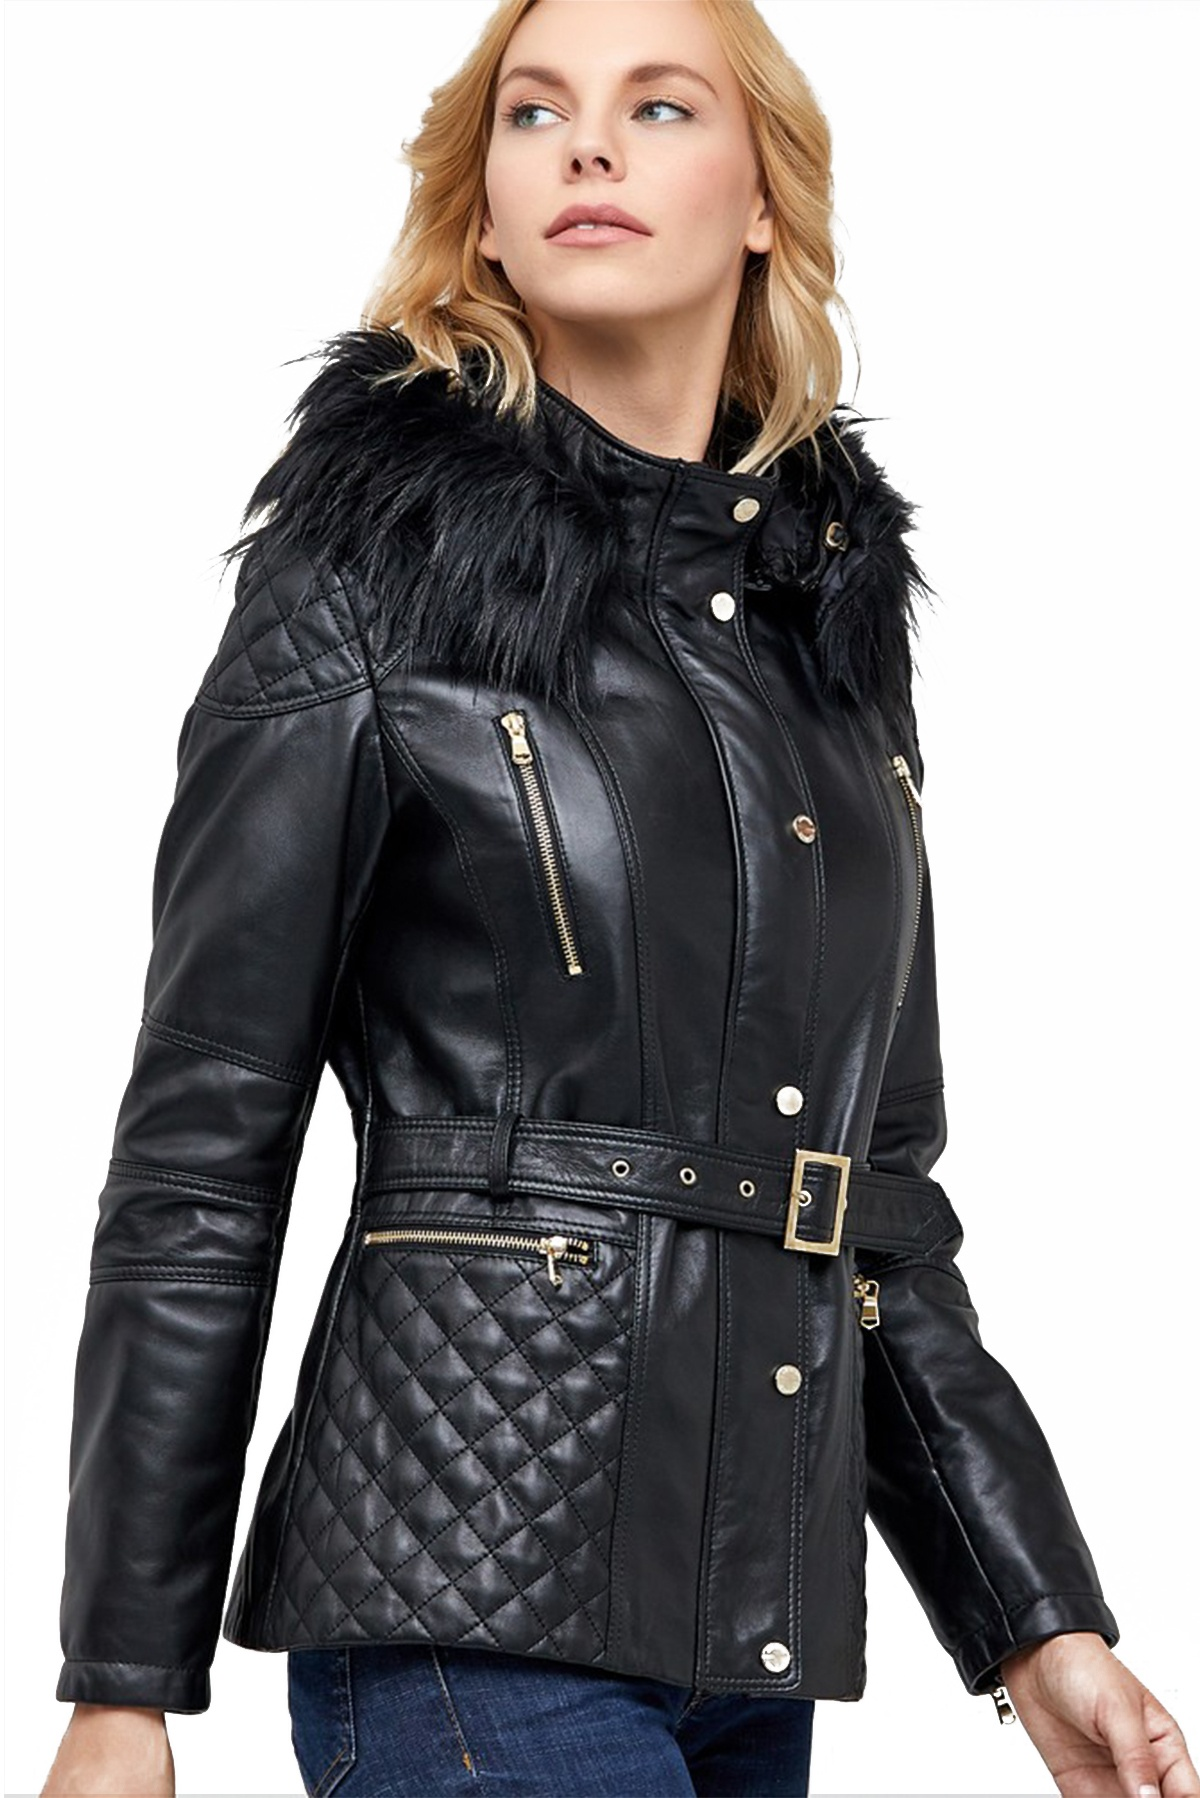 genuine leather jacket with hood